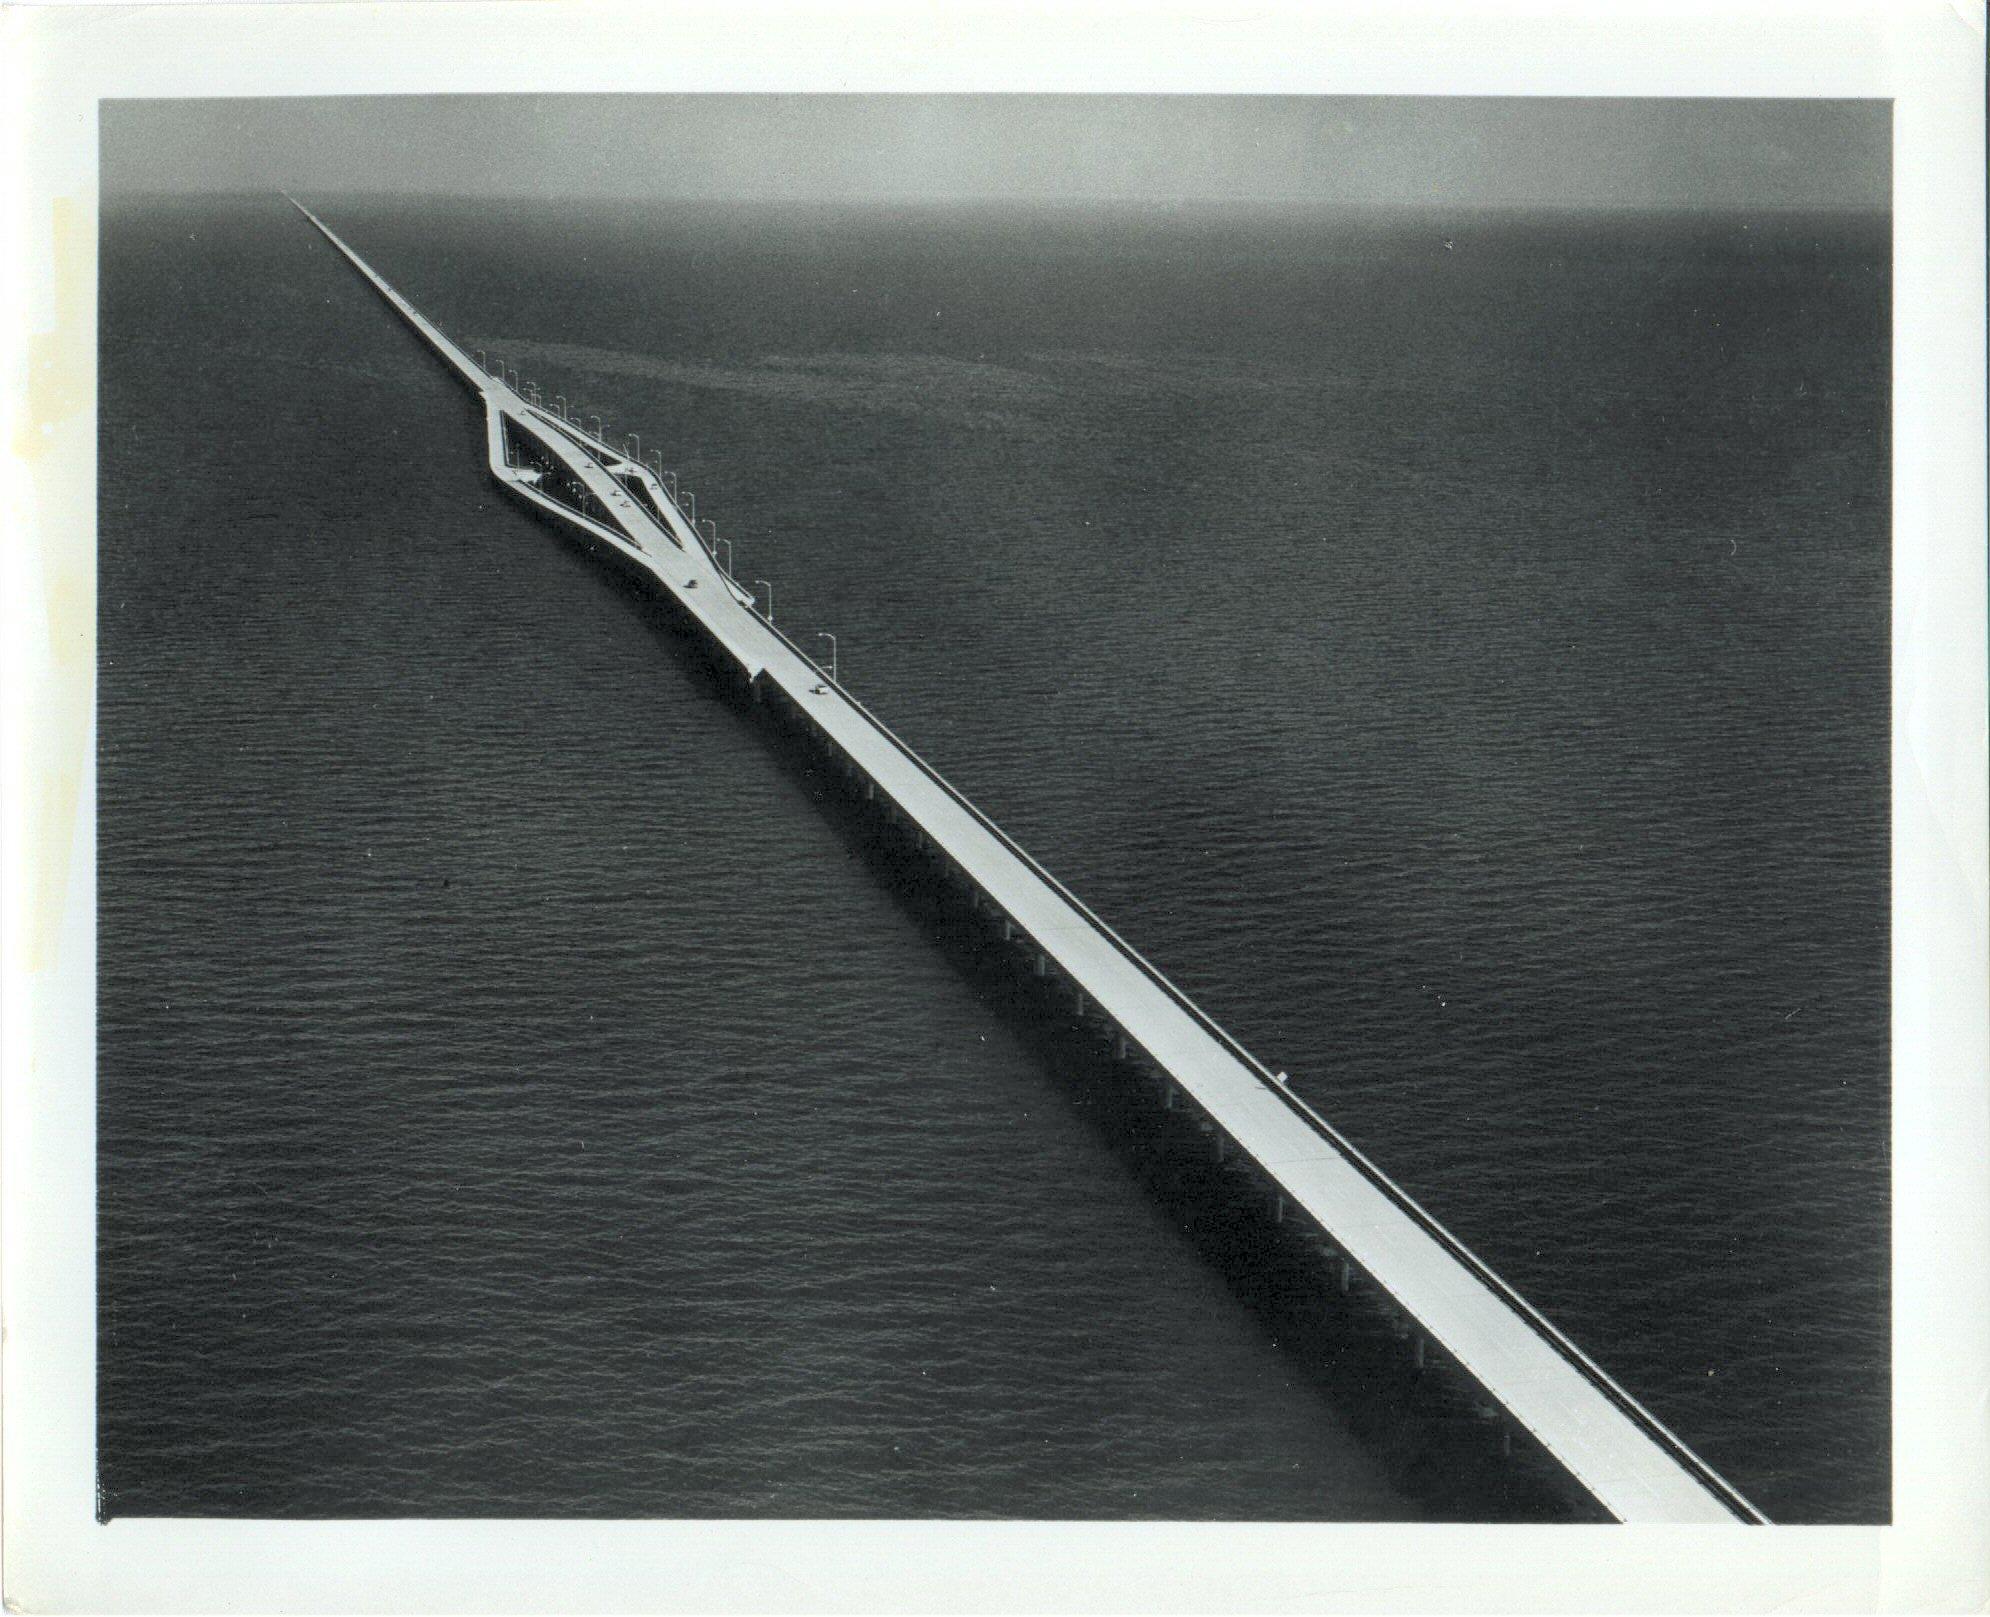 30AUG1956: Original 23.86-mi span of #ASCE landmark #PontchartrainCauseway opens to traffic; world's longest continuous #bridge over water https://t.co/zxKjKT9CNM